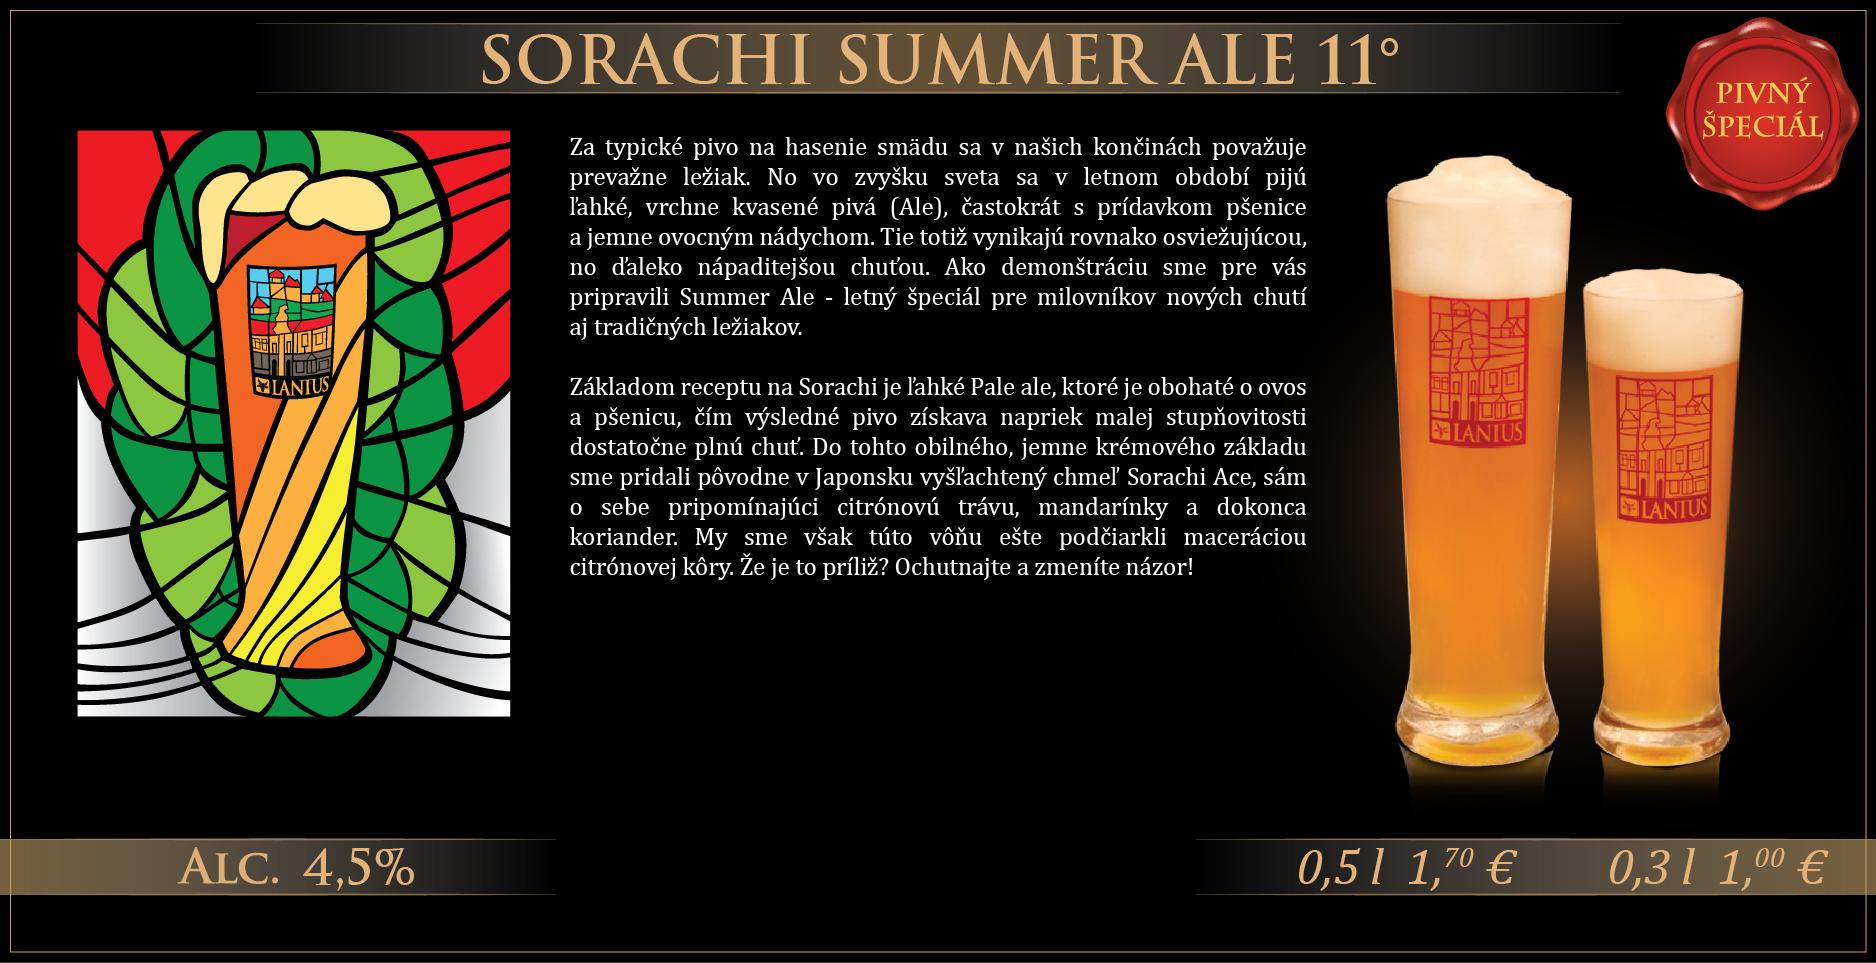 SORACHI SUMMER ALE 11 WEB-02